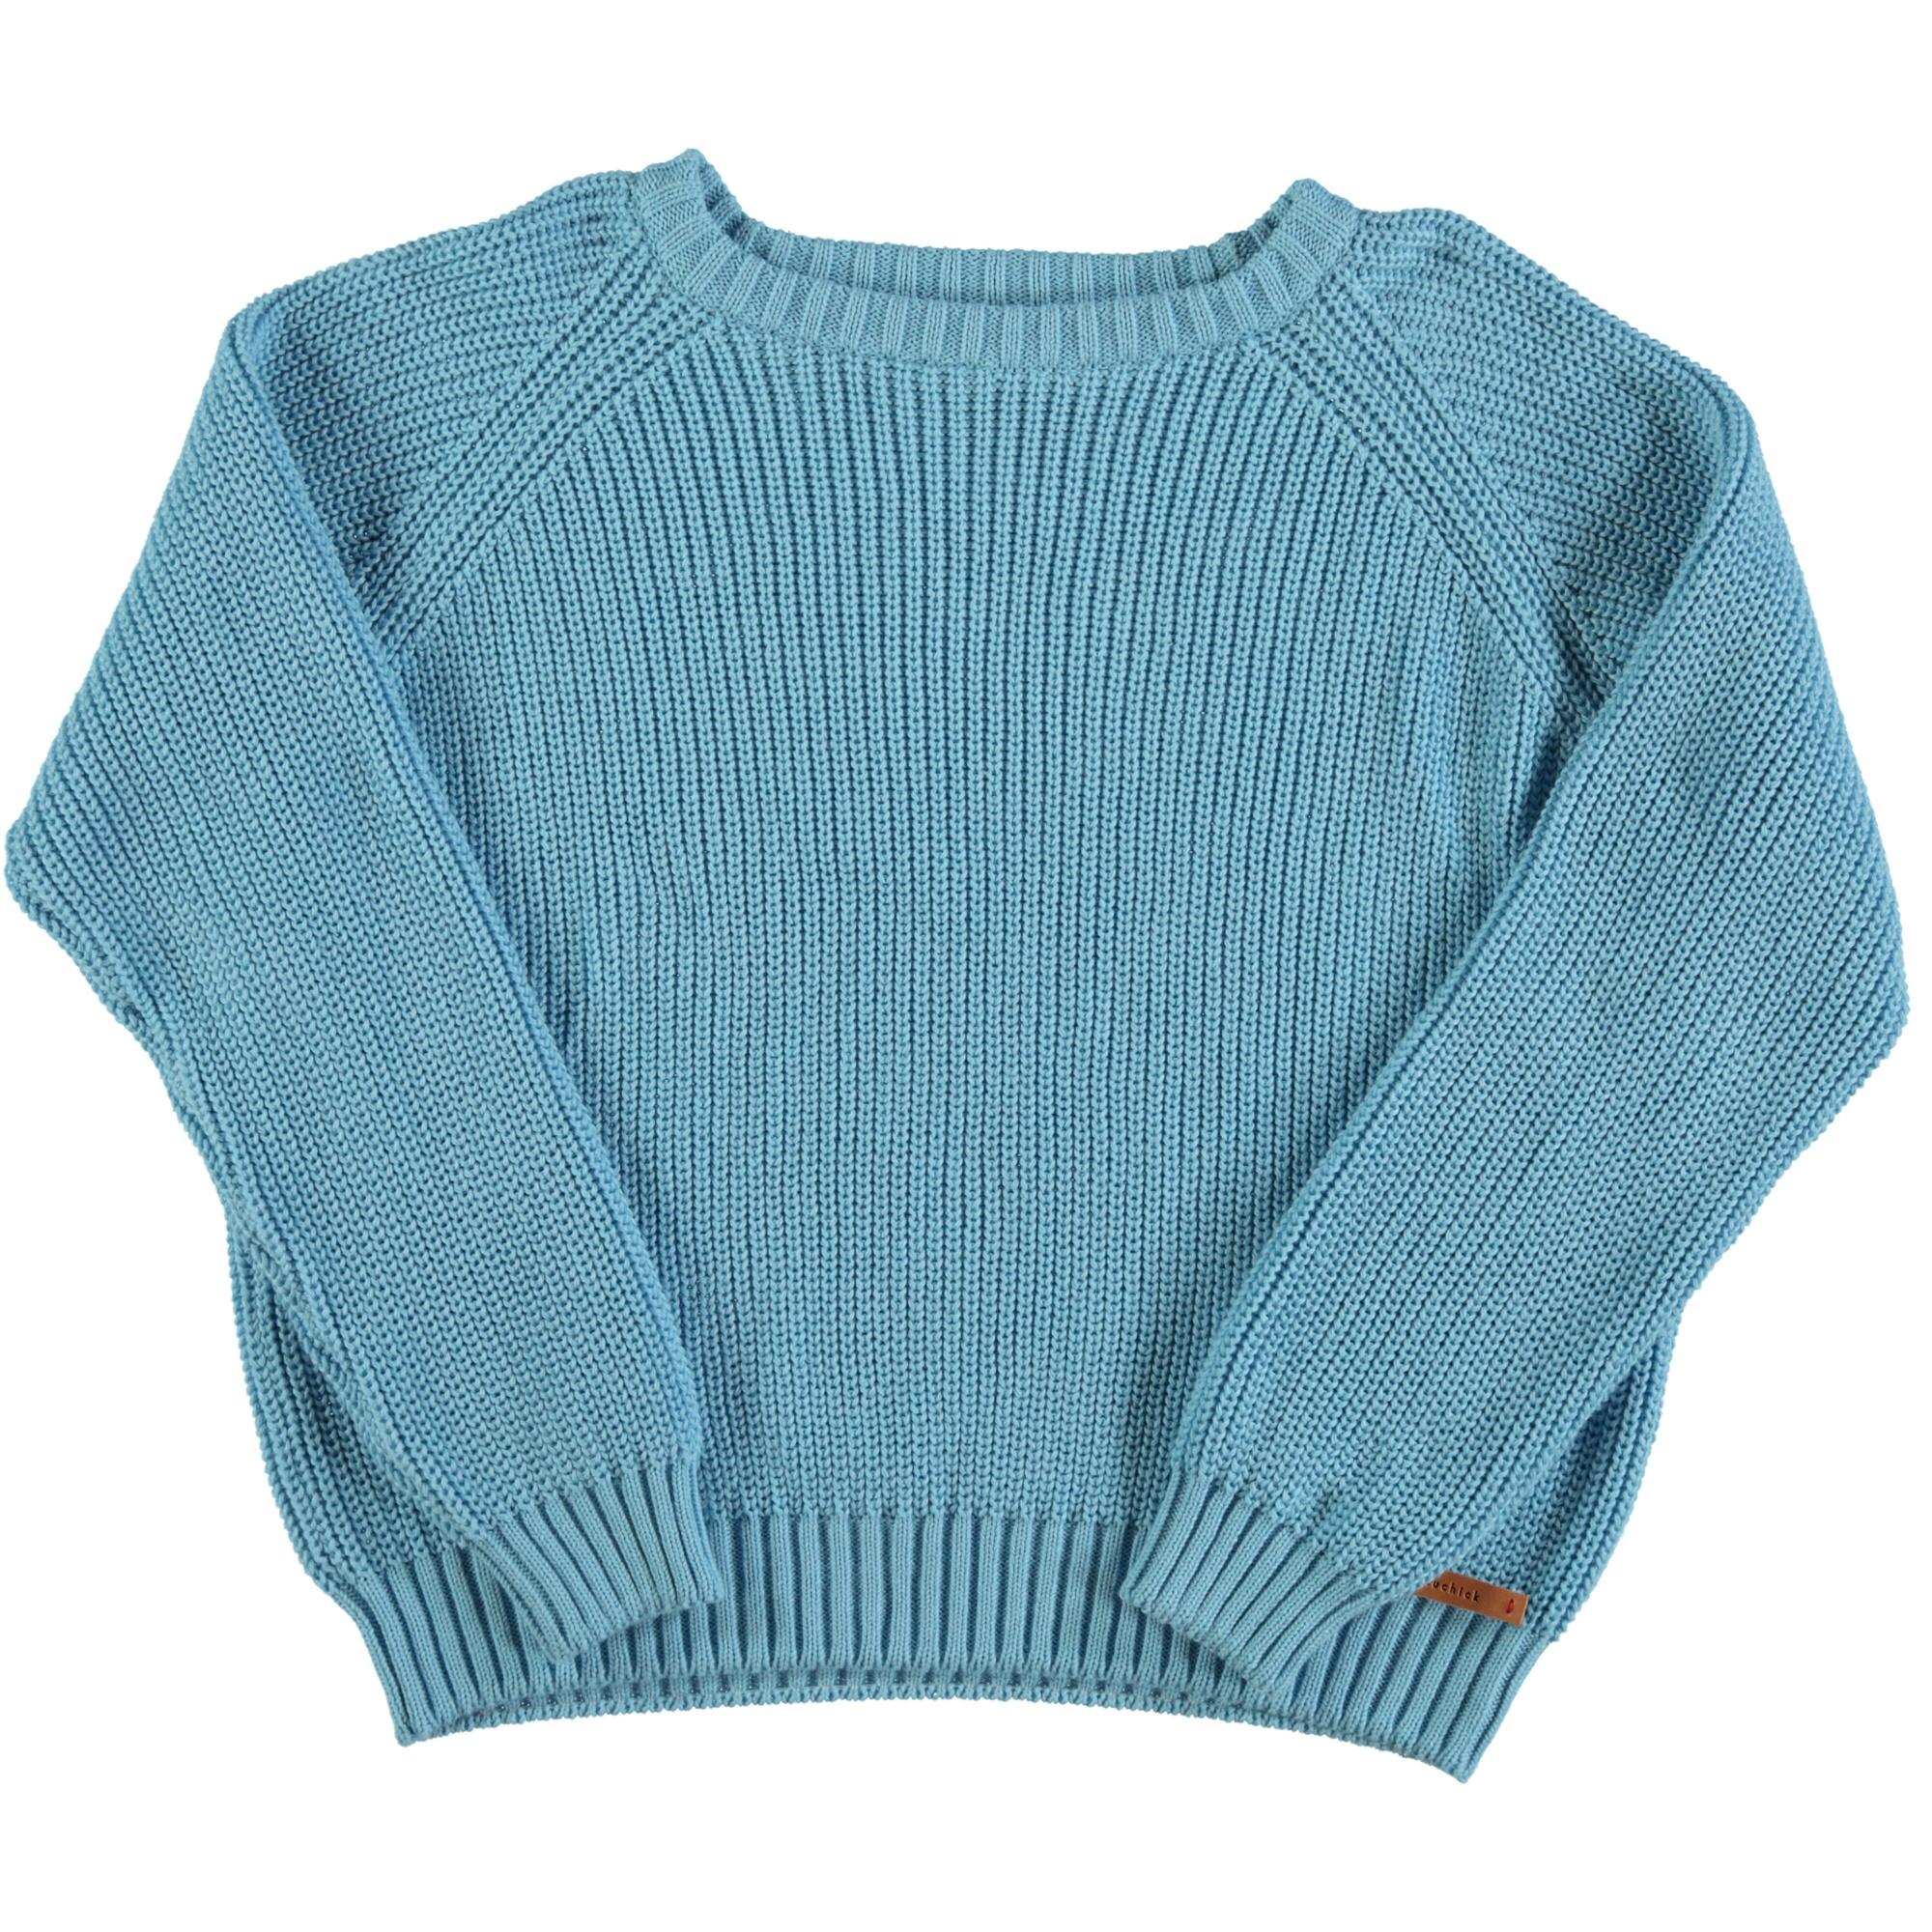 "knitted sweater | blue w/ garnet ""Leone d'or"" print-1"